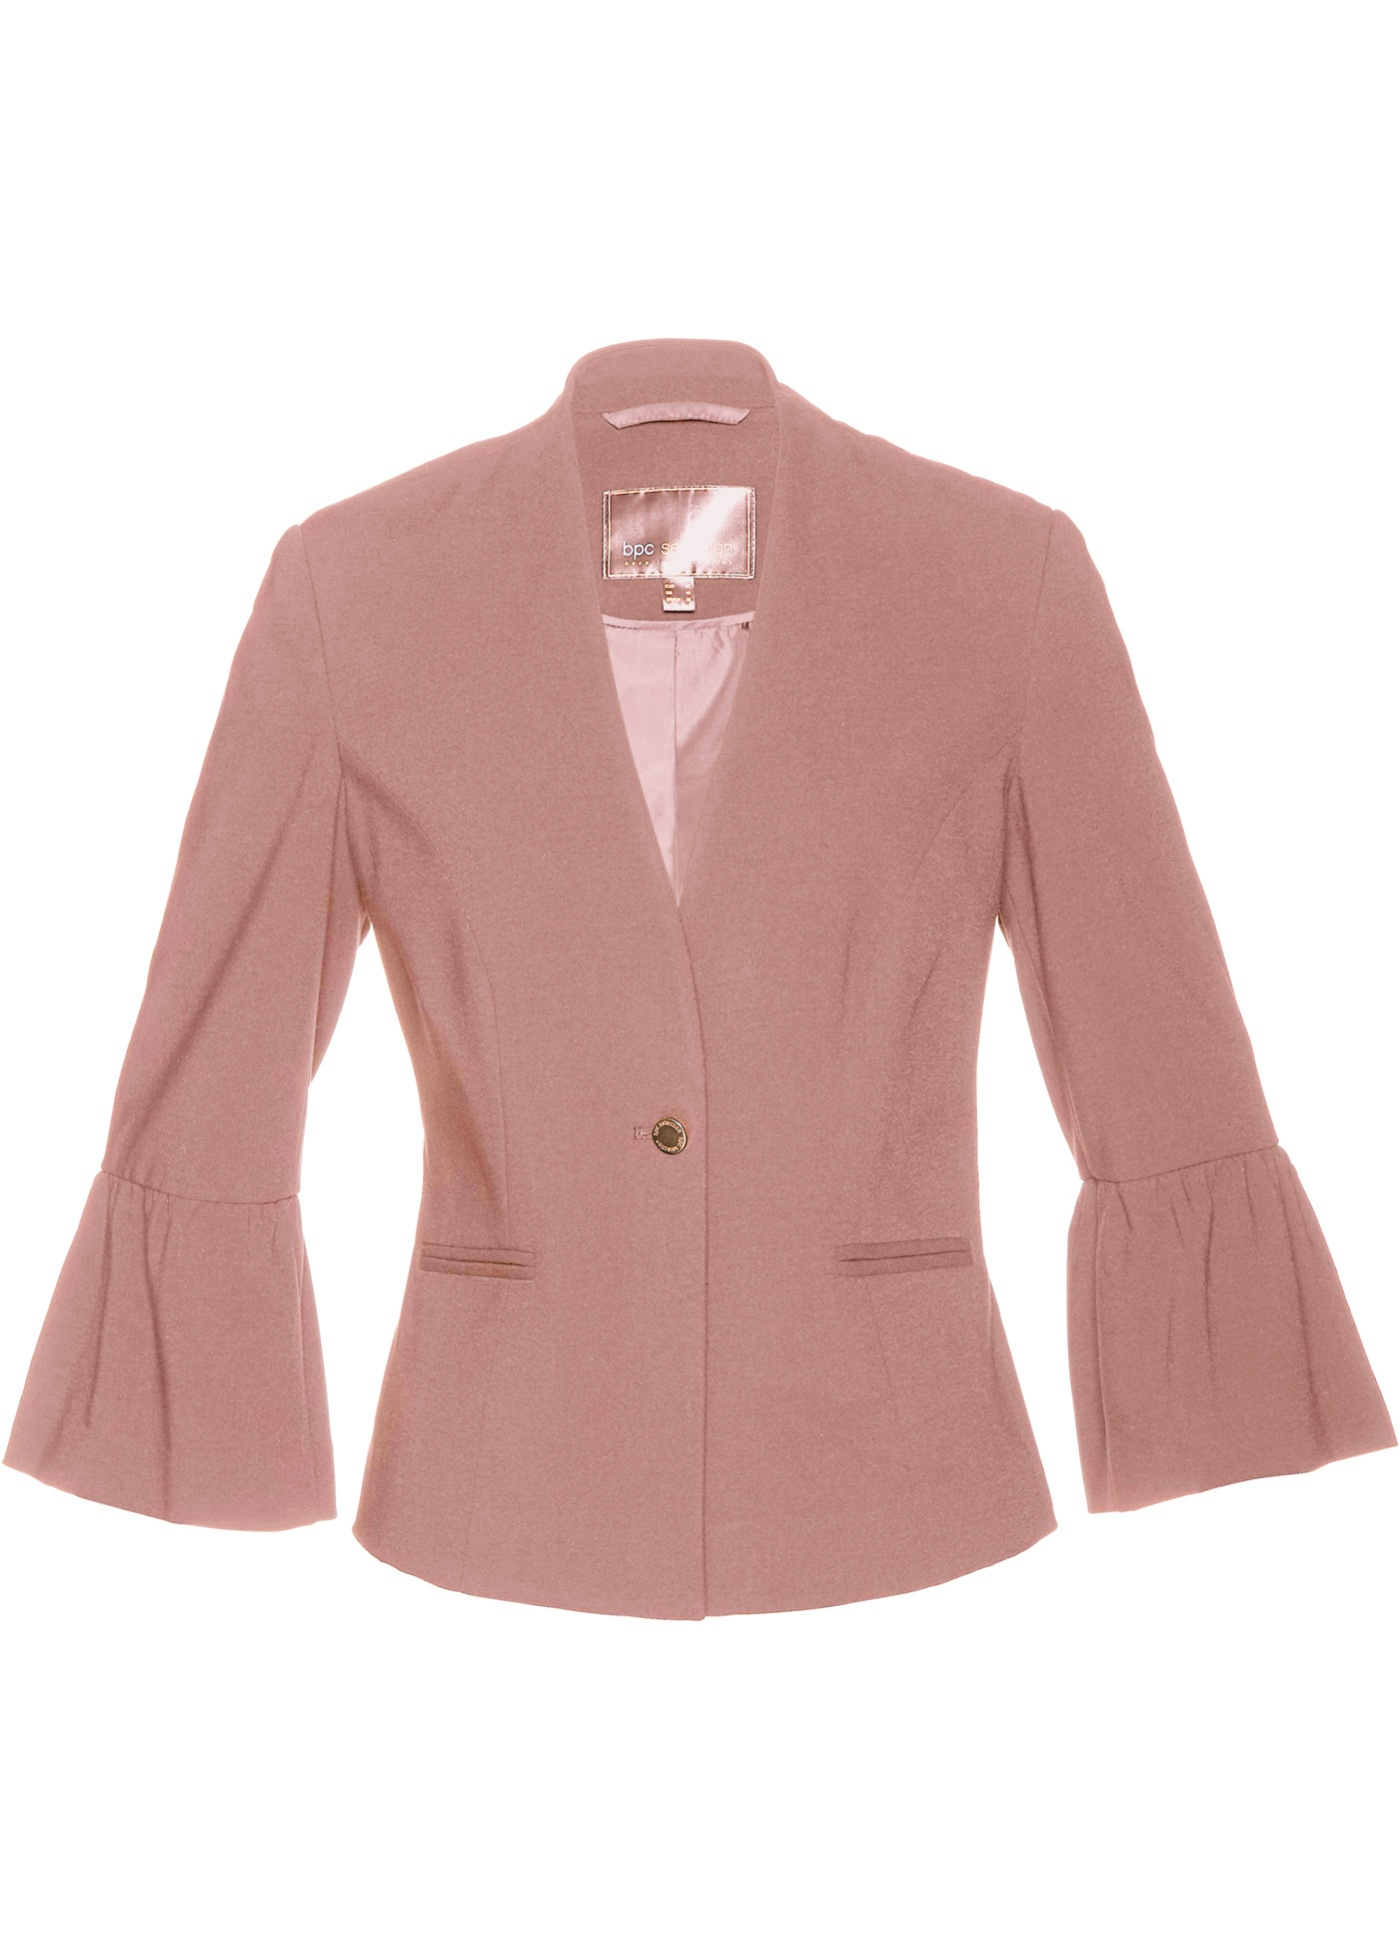 Blazer corto (rosa) - bpc selection